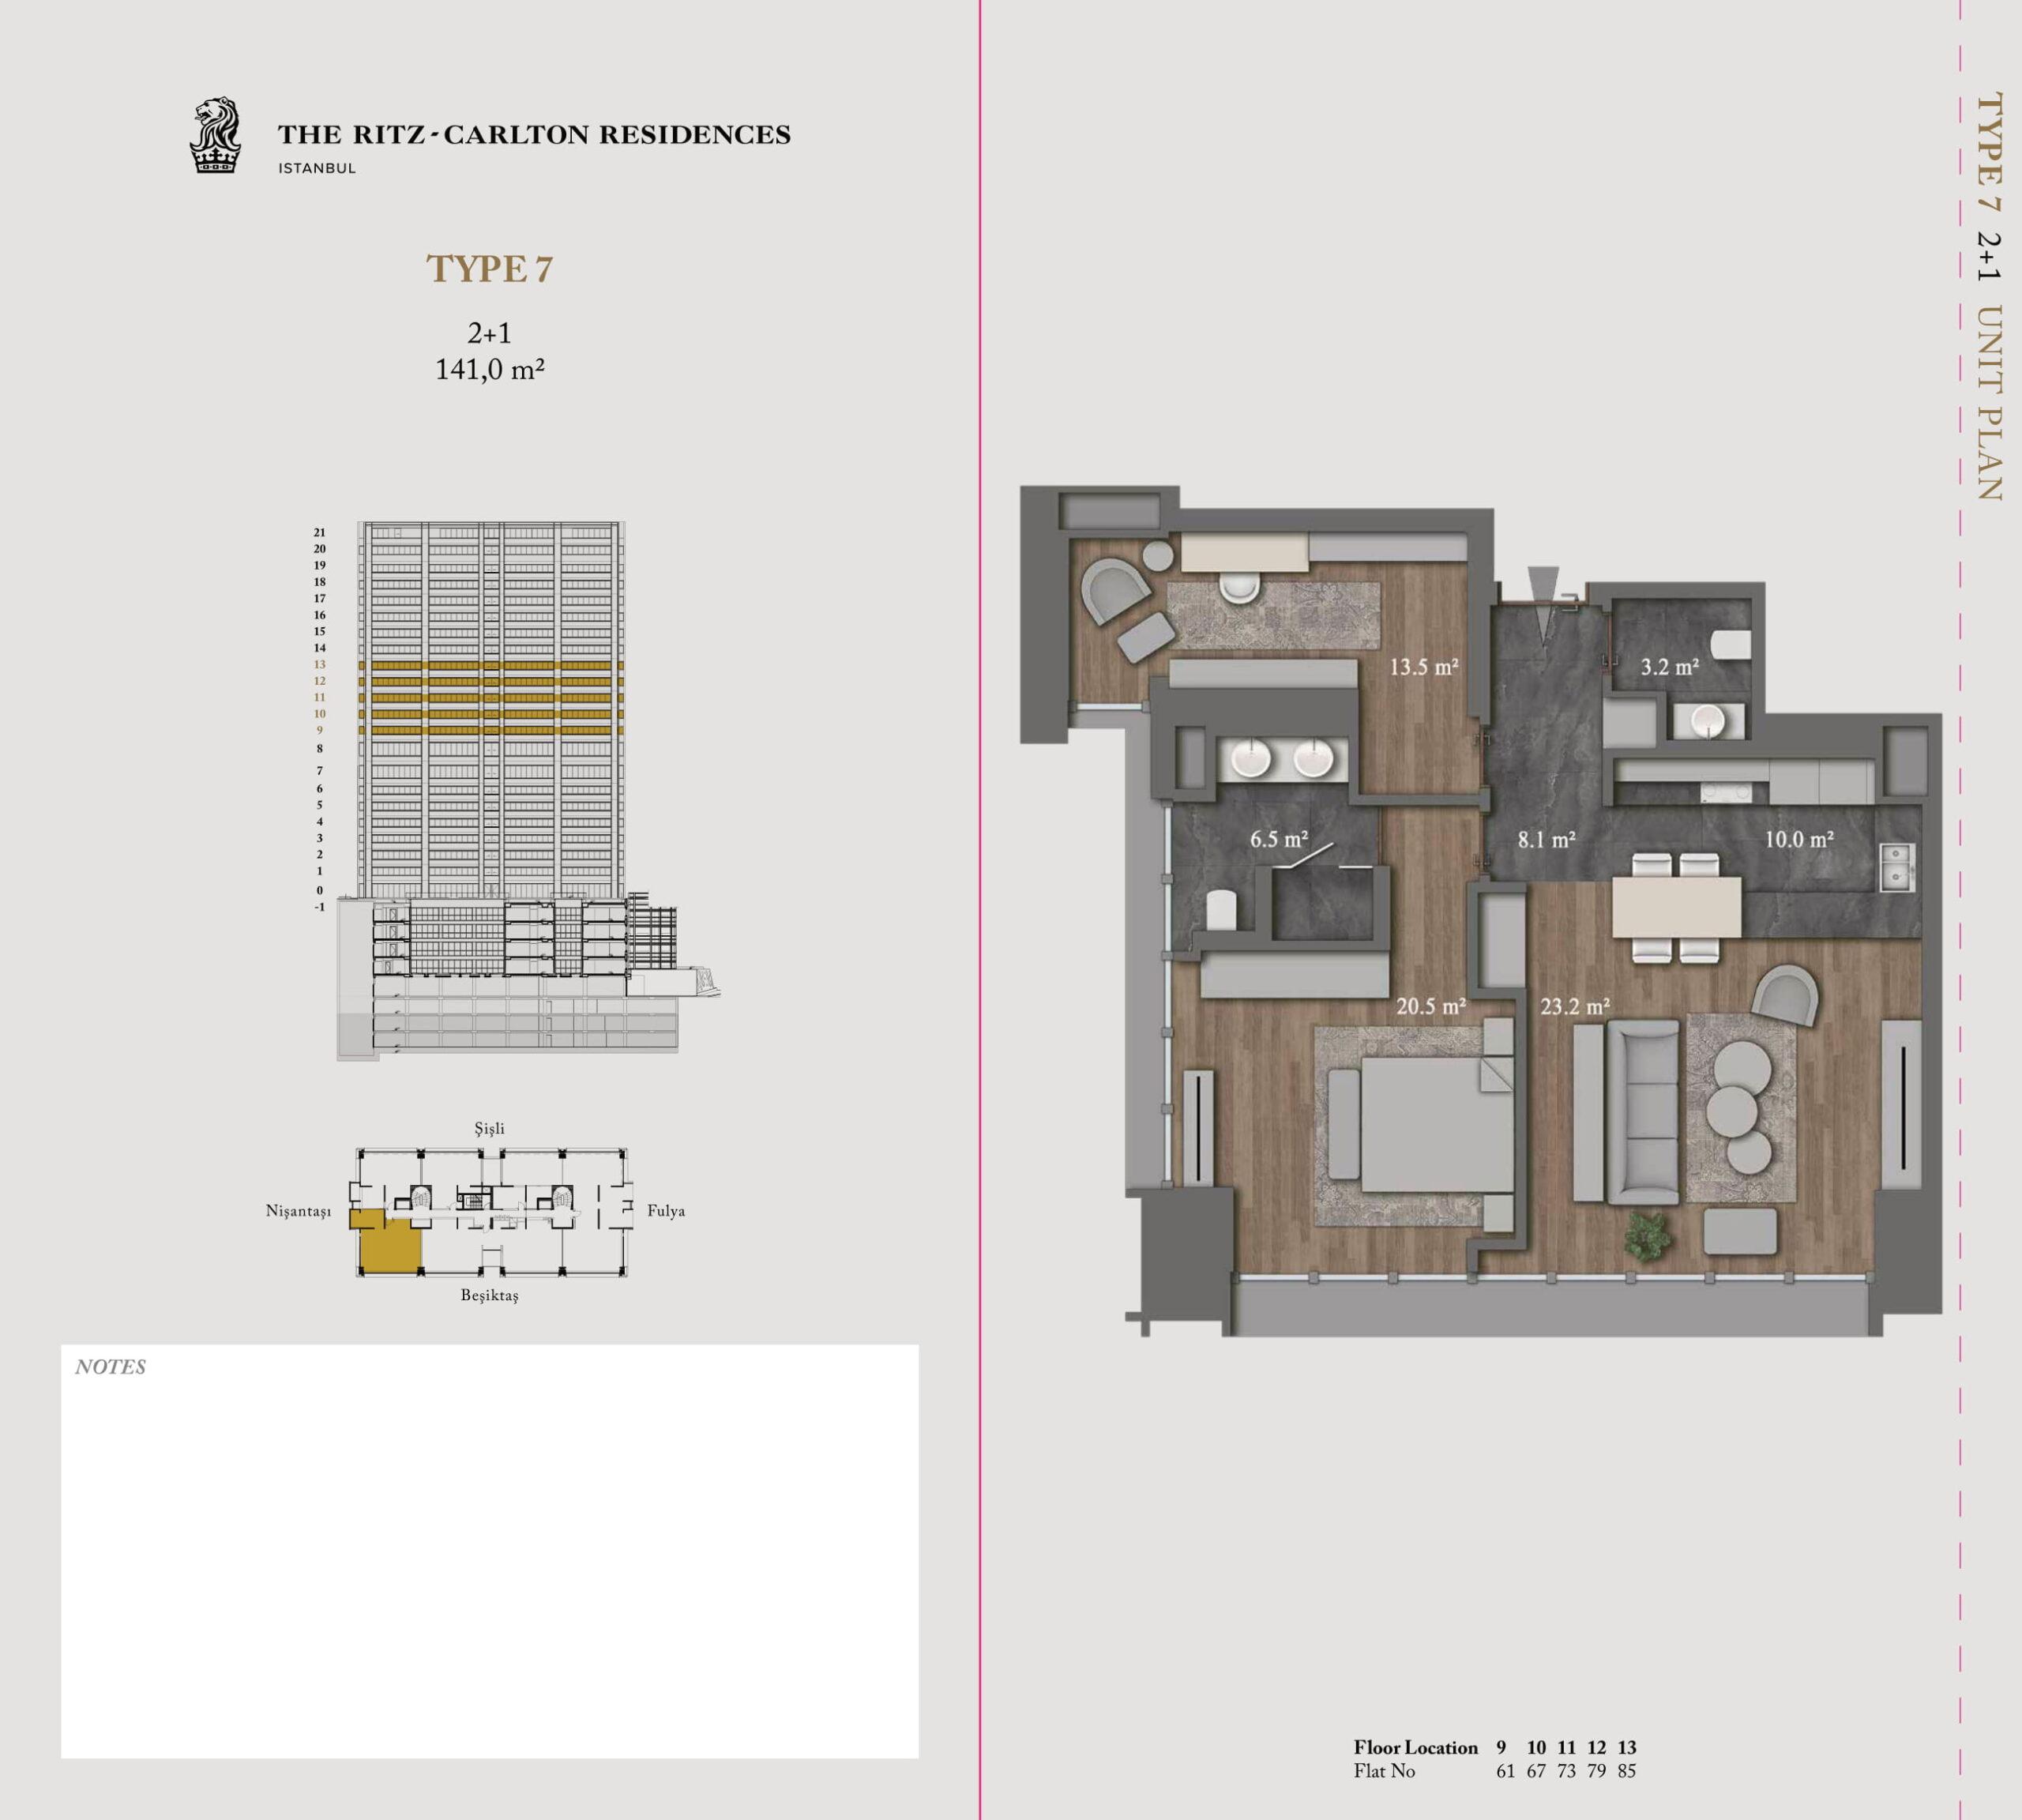 The Ritz-Carlton Residence